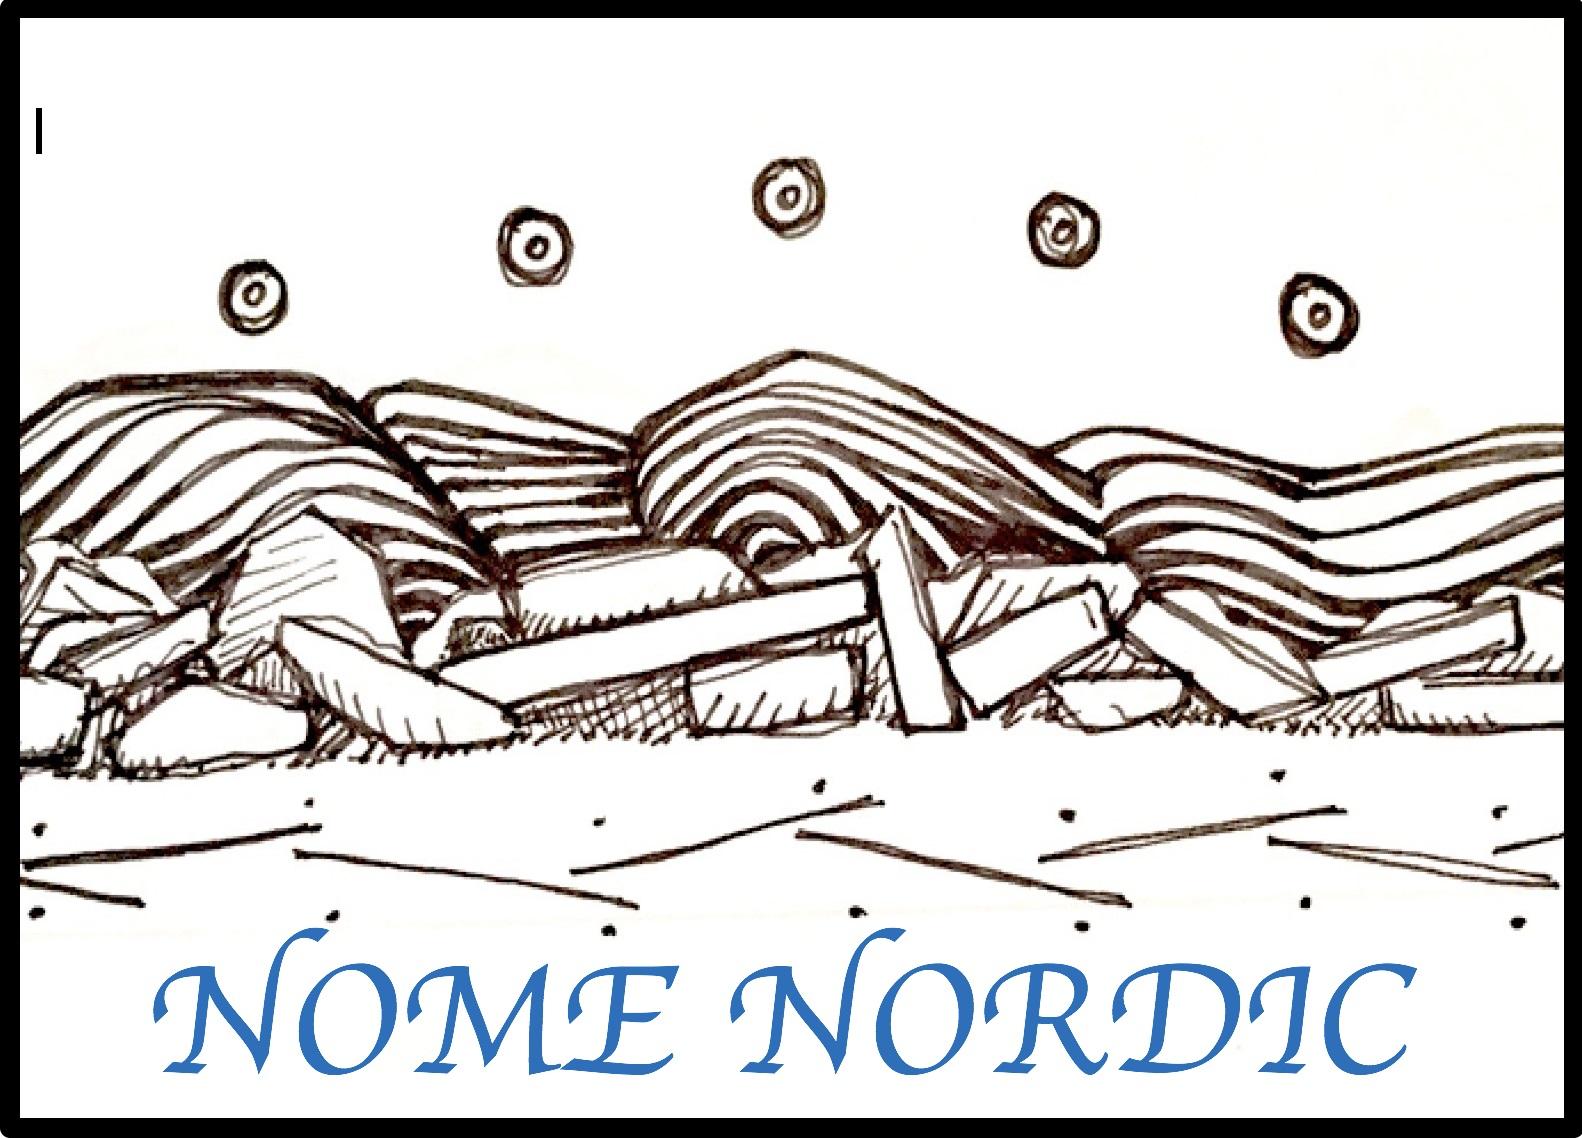 nome nordic rorabaugh biathlon